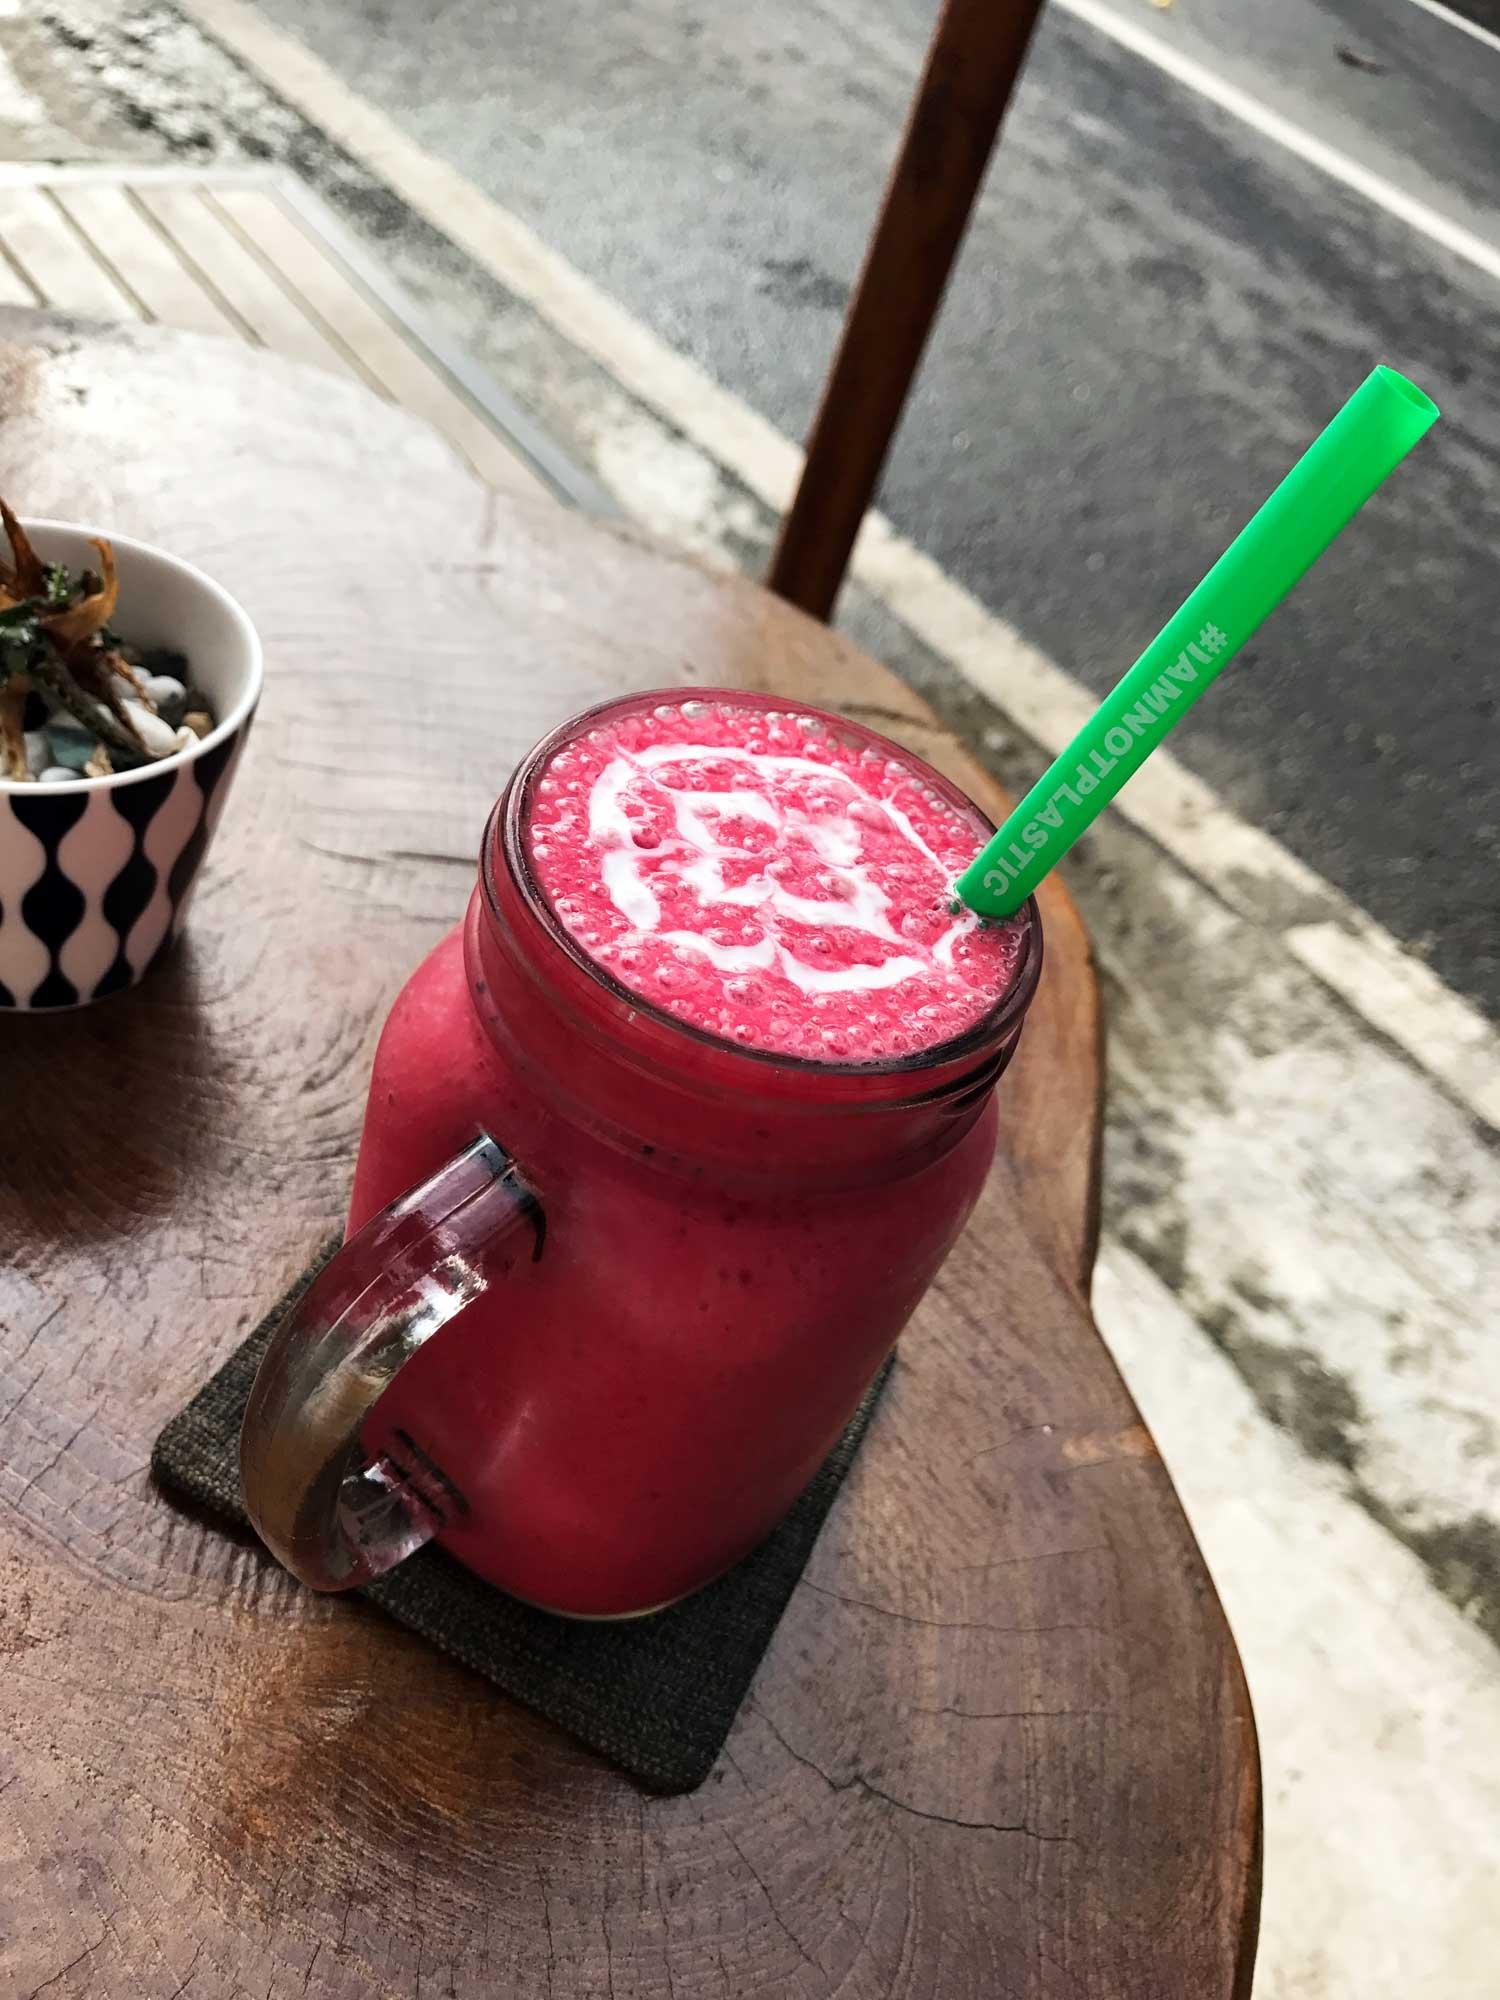 Bali Bowls and Smoothies - Canggu - Travel Blog - Screw Them All